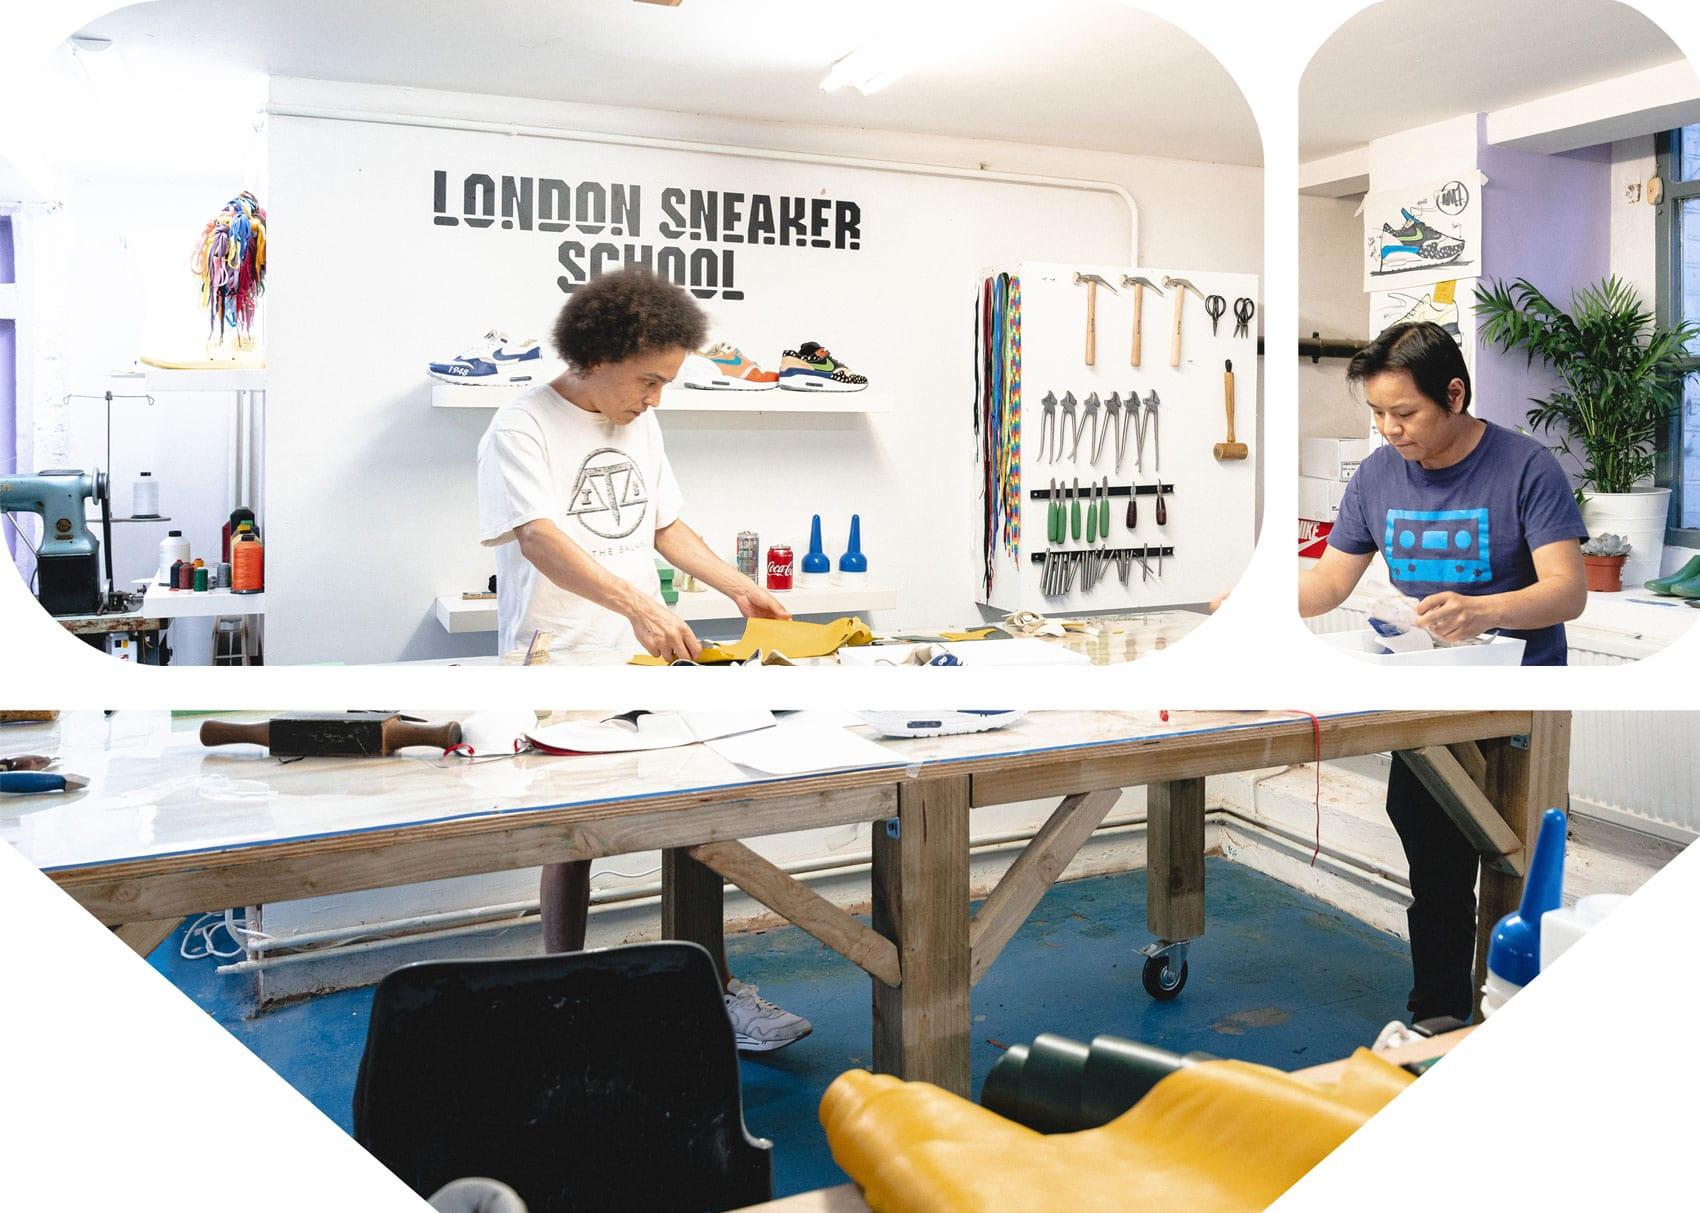 Student shoemakers at London Sneaker School